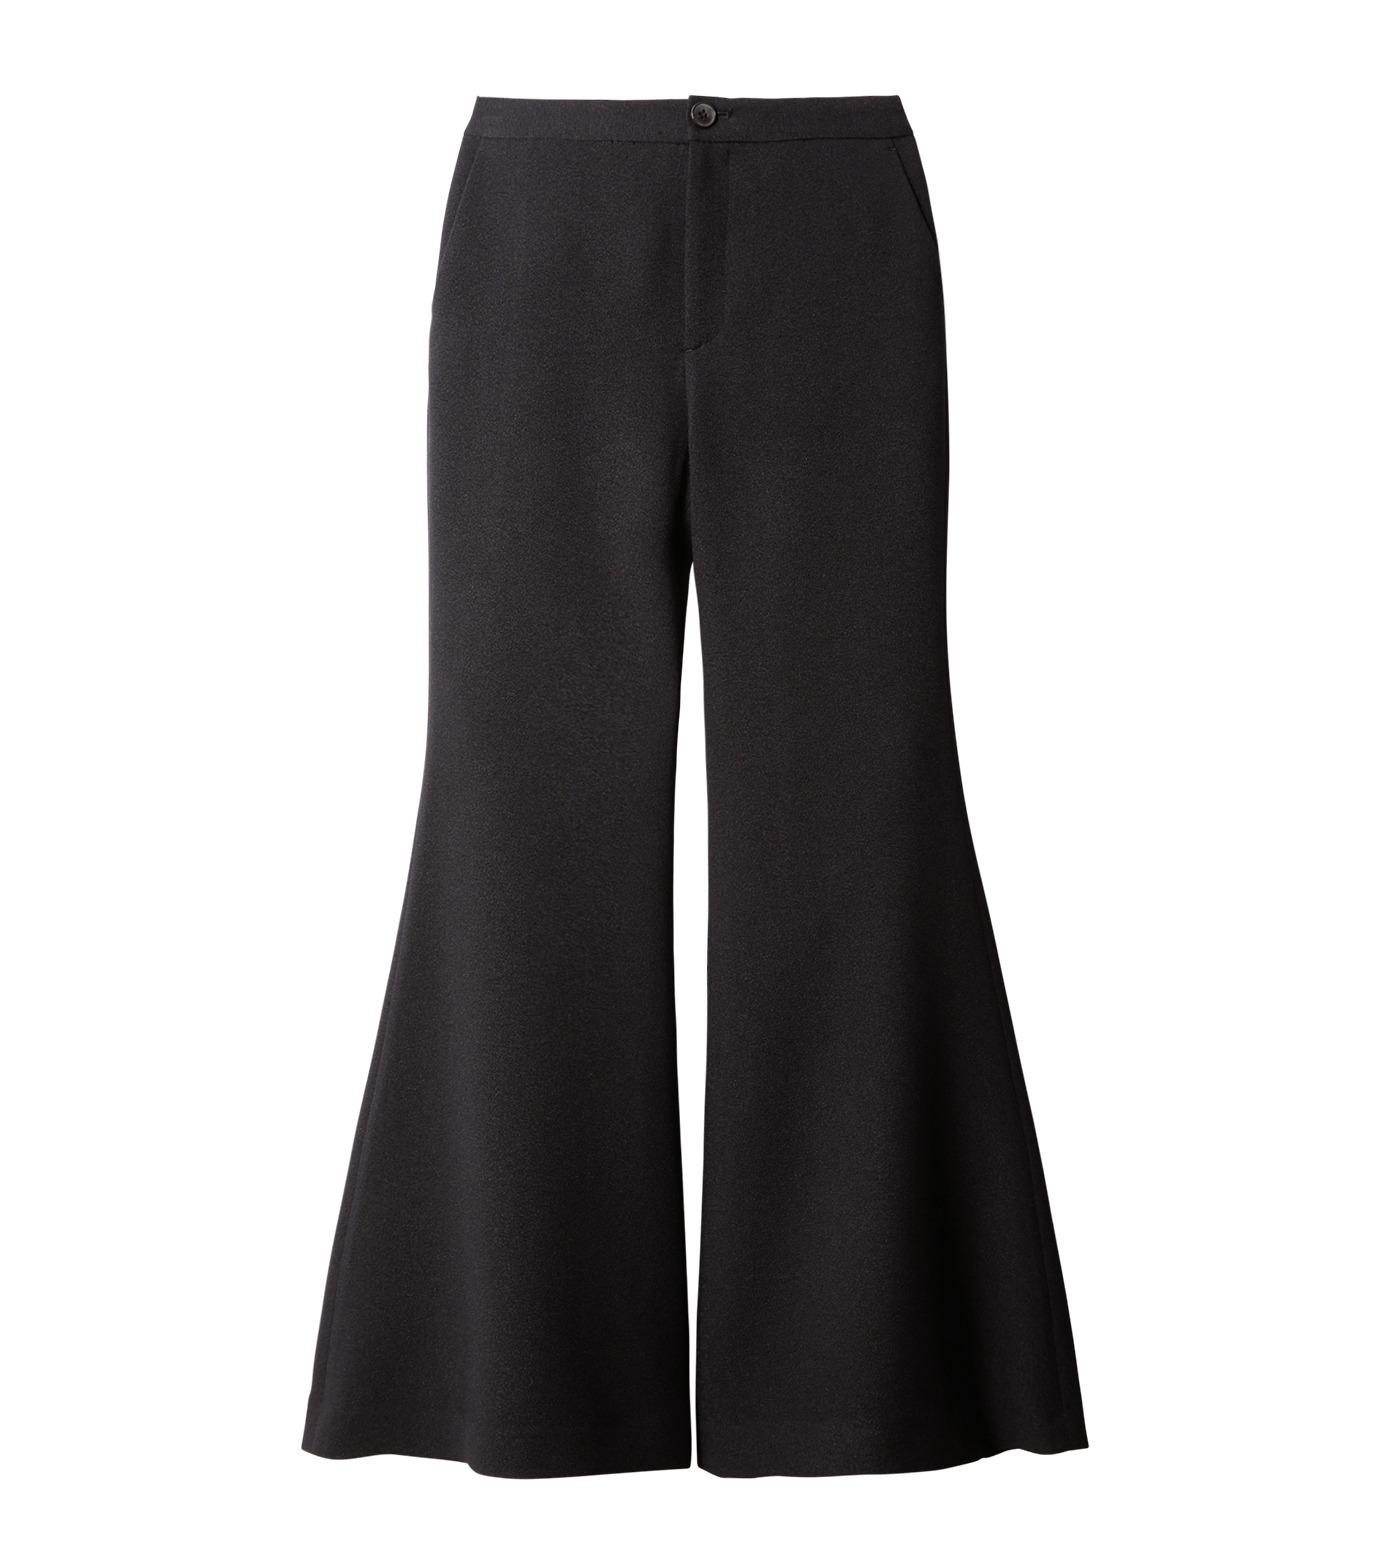 IRENE(アイレネ)のトランペットトラウザー-BLACK(パンツ/pants)-18A88002 拡大詳細画像8